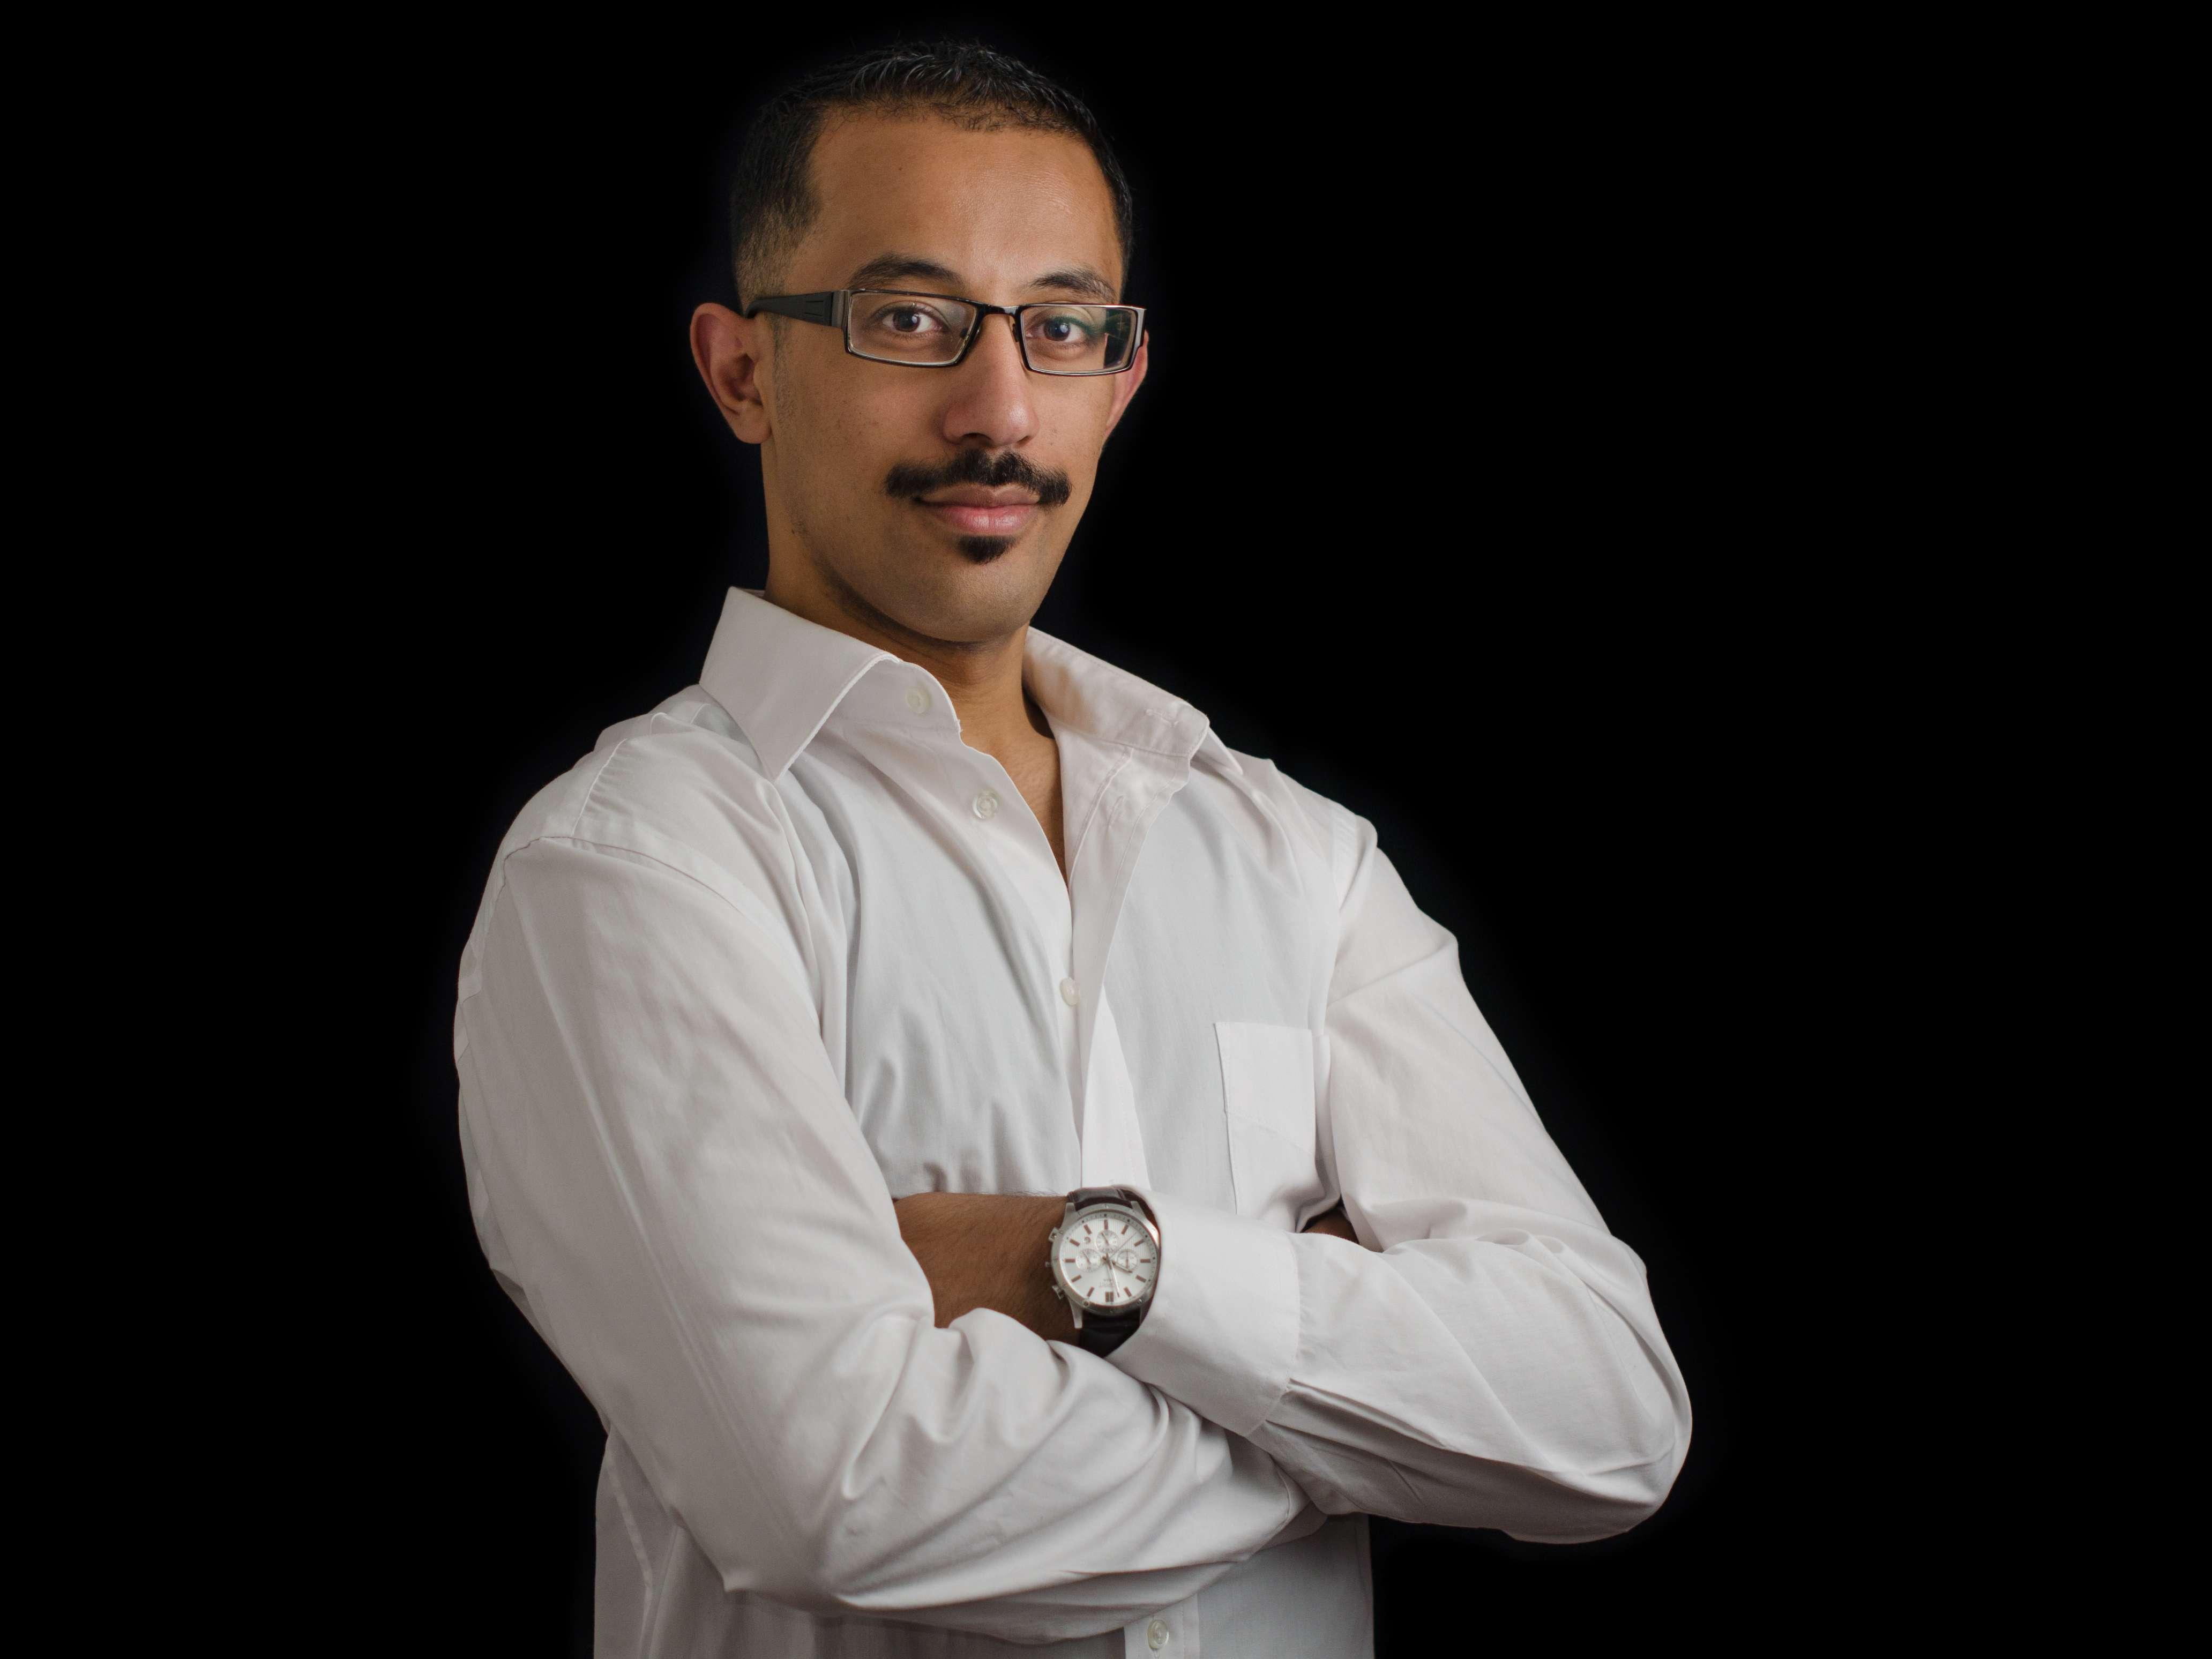 Younes Lahmar - 3ss webbureau